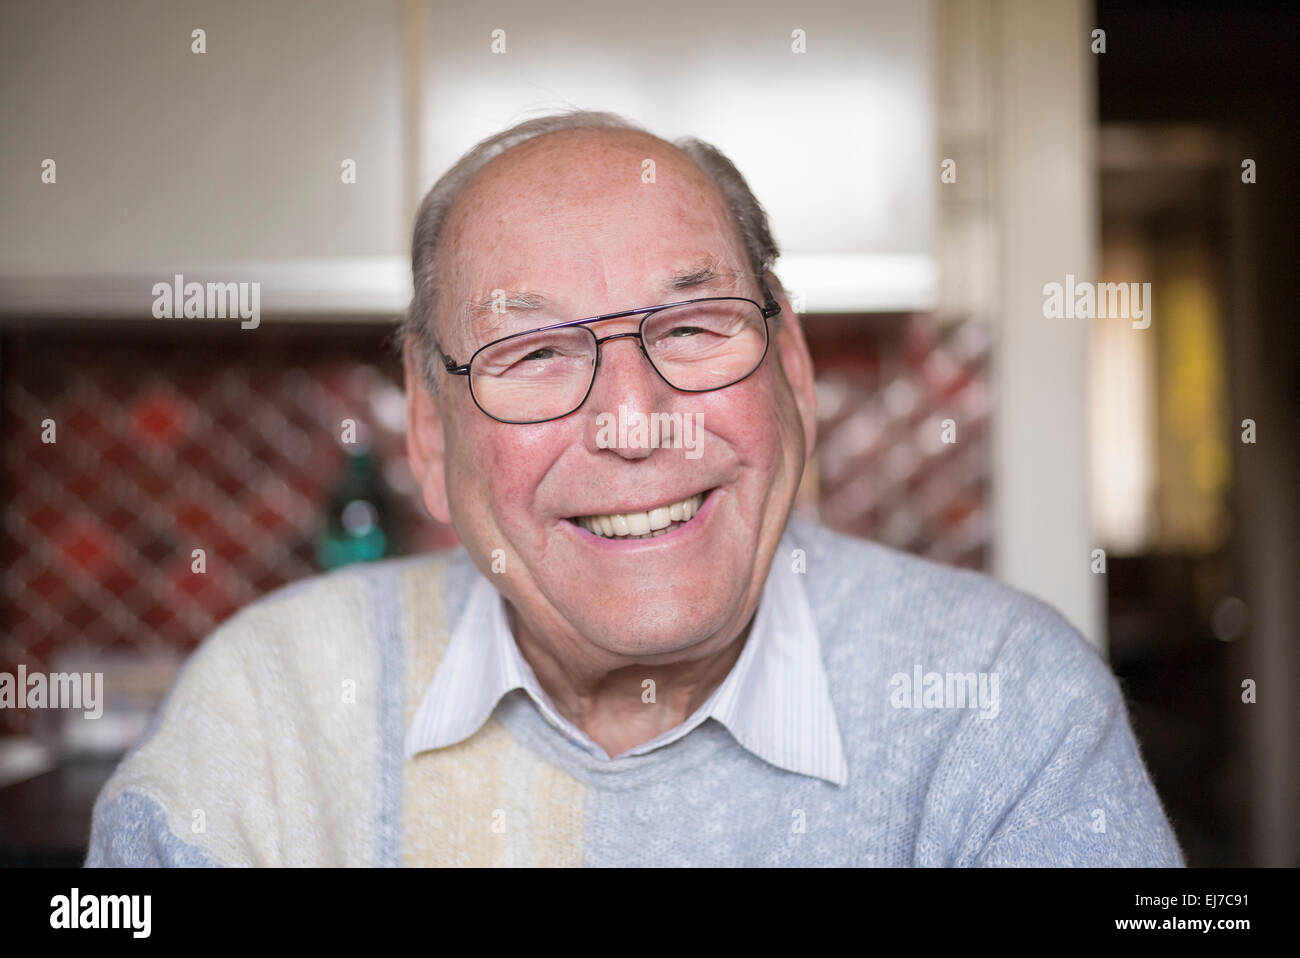 80s sonriente anciano retrato, retrato riendo macho Imagen De Stock